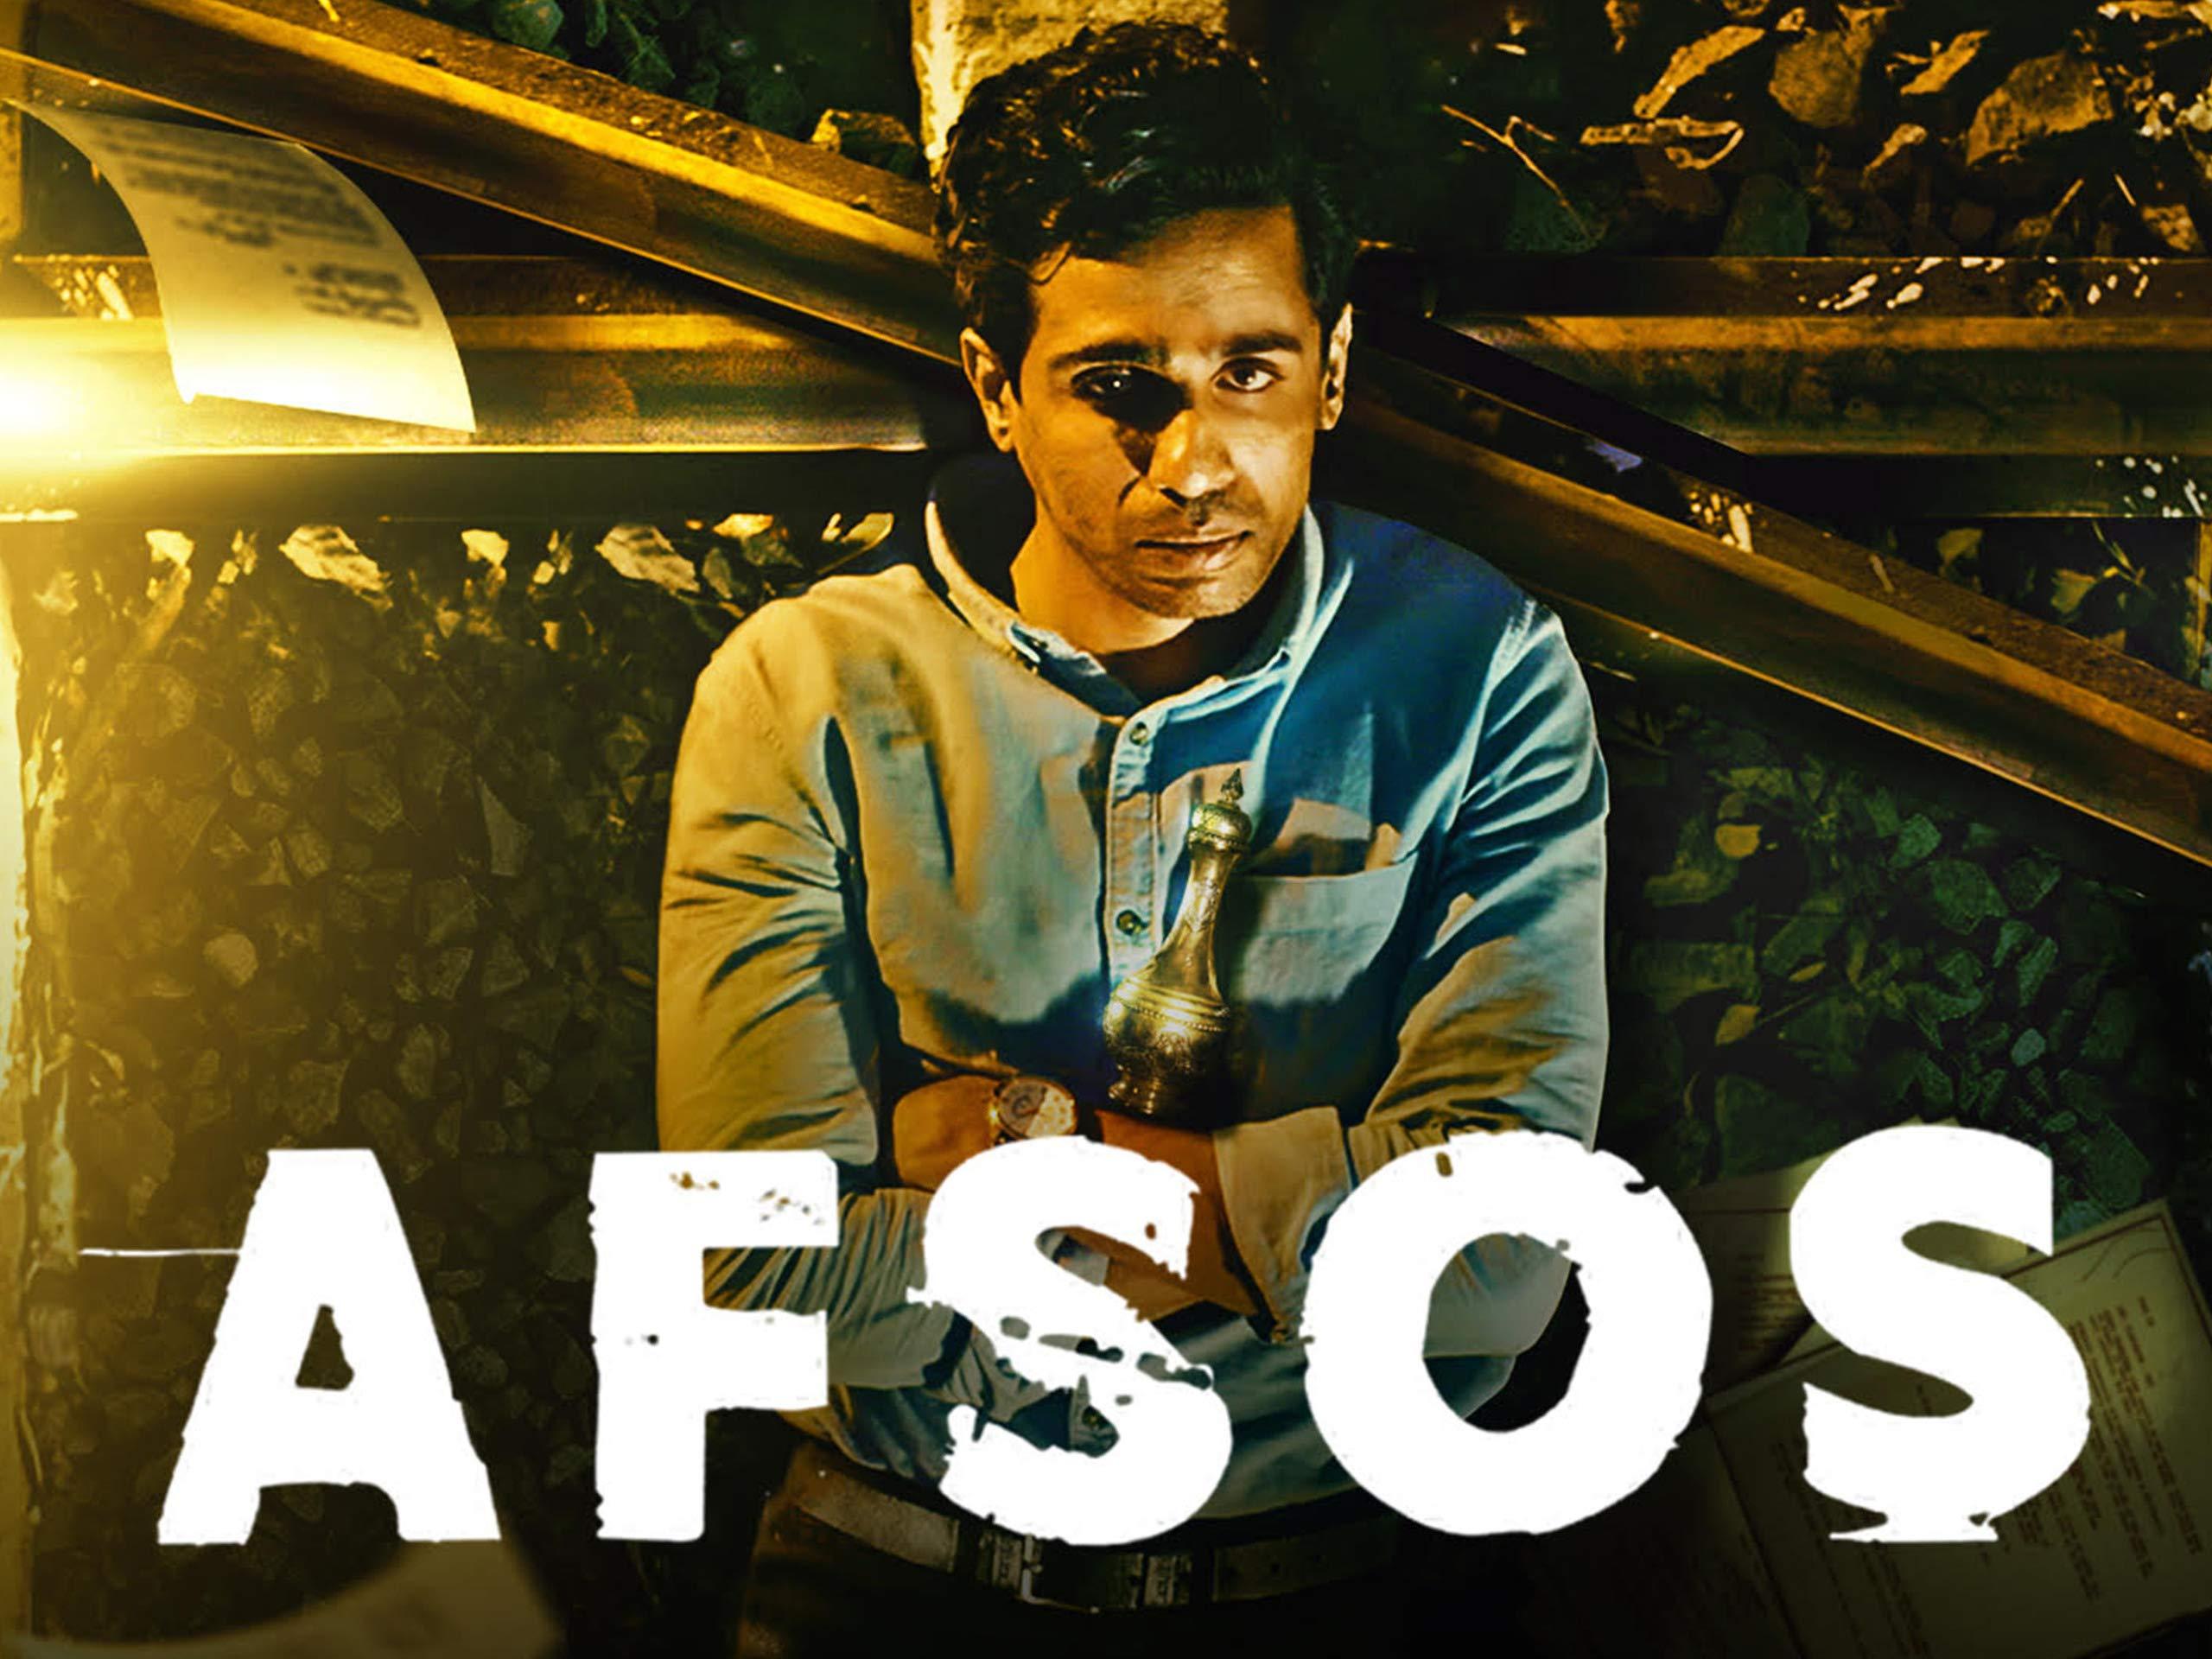 Amazon.com: Watch Afsos - Season 1 | Prime Video